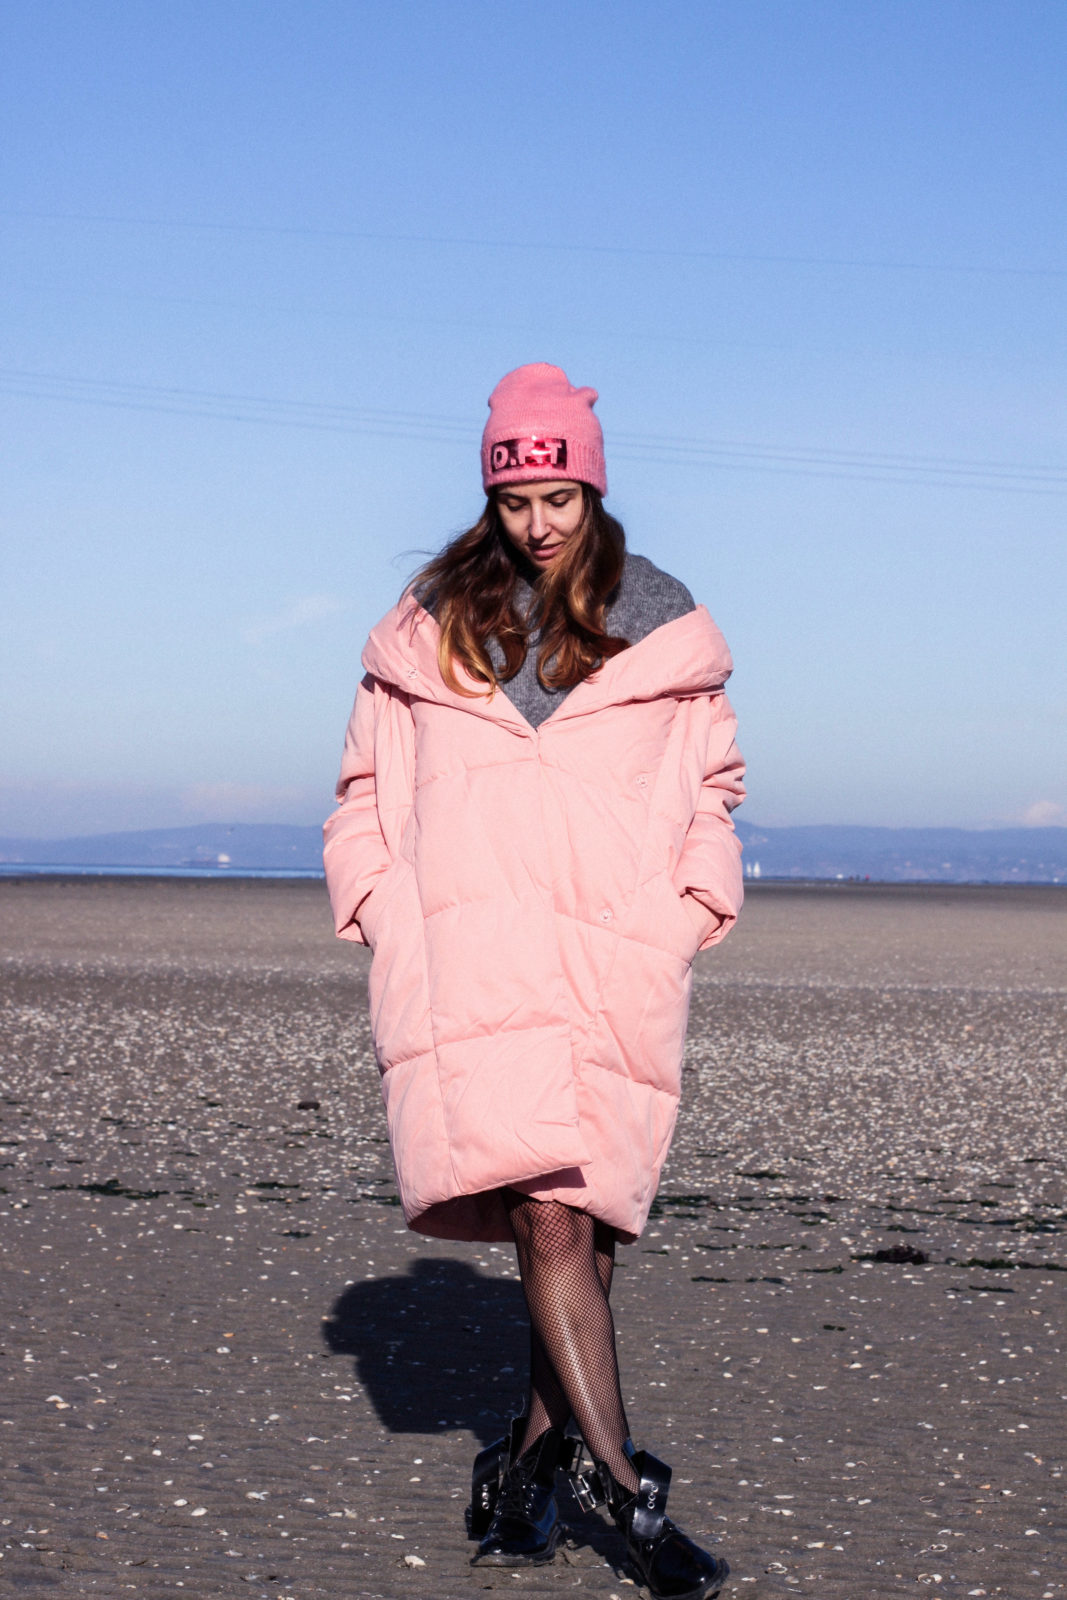 retailmenot-cupones-descuentos-asos-plumifero_rosa-monki-puffer_coat-gorro-beanie-medias_de_rejilla-look-outfit-tendencias-fall-2016-street_style-donkeycool-27